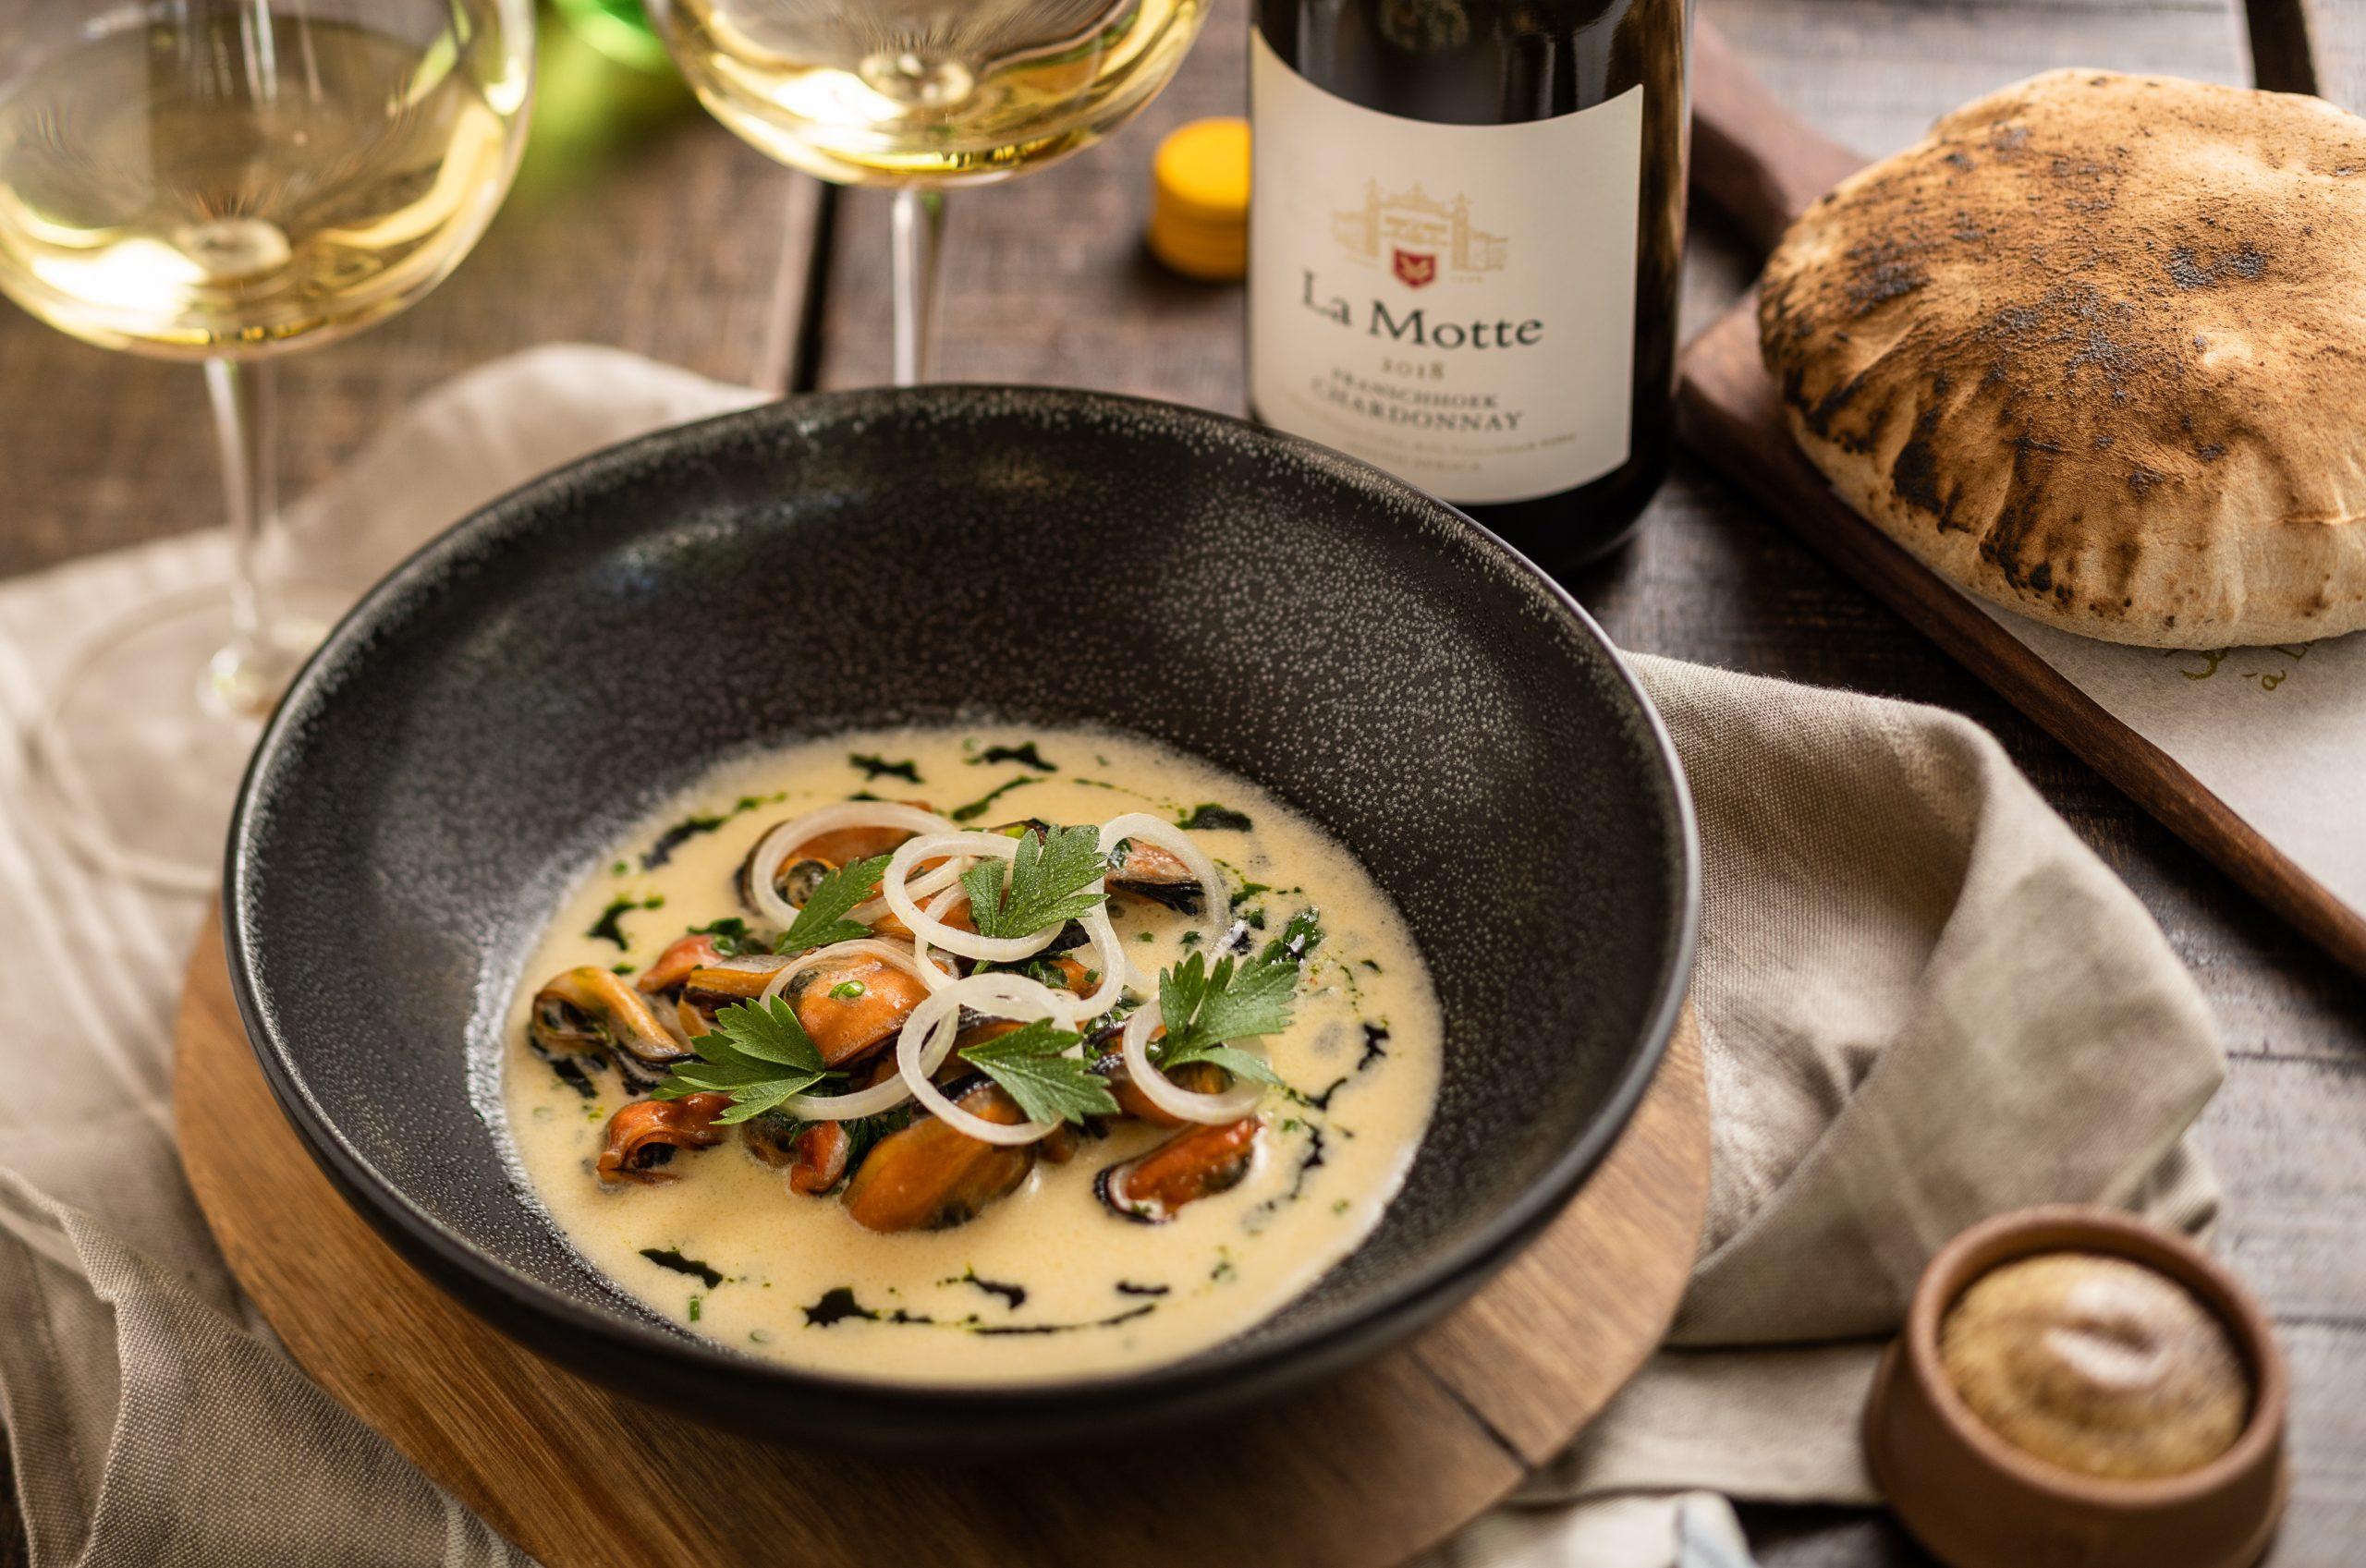 La Motte Releases An Extraordinary And Award-Winning 2019 Chardonnay photo